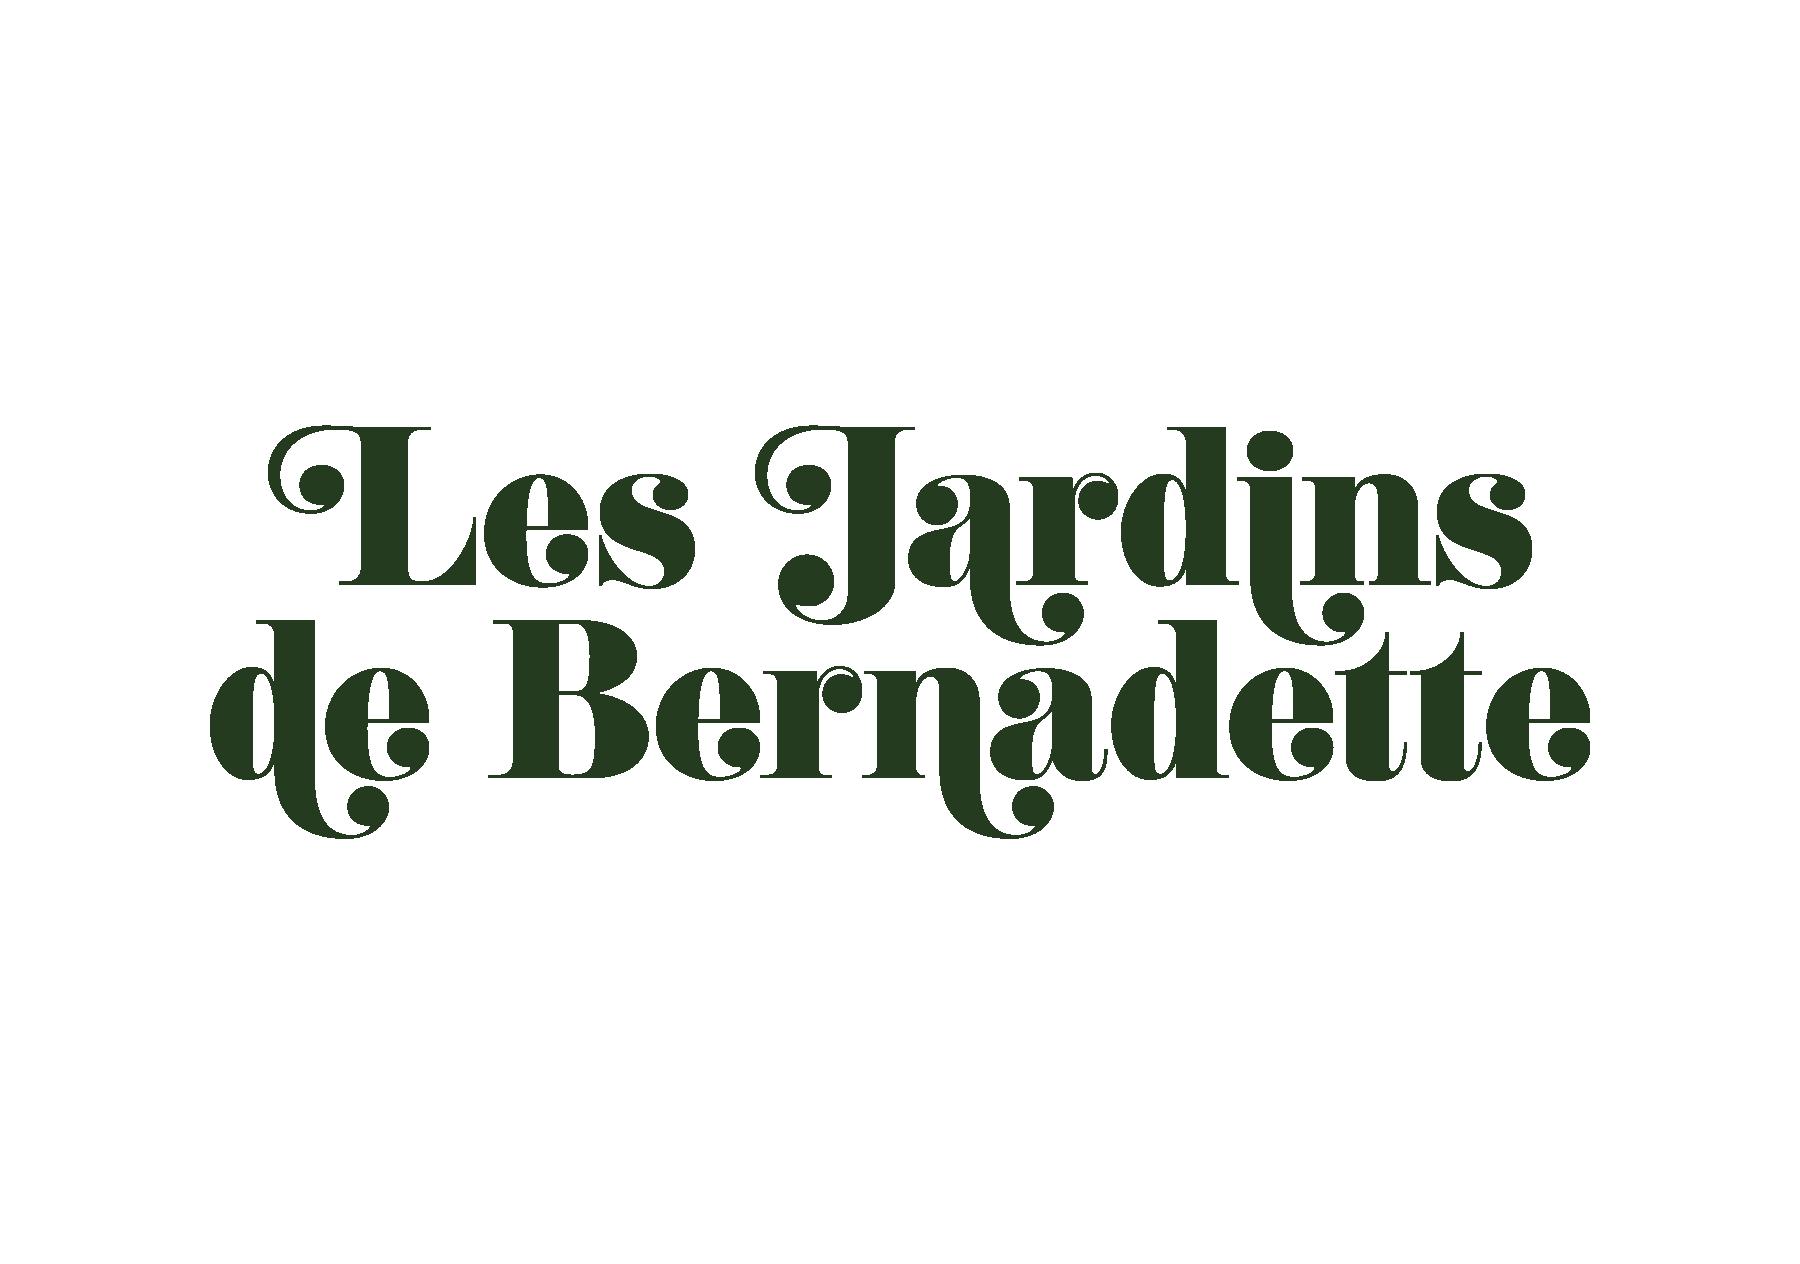 les jardins de bernadette – josselin tourette – logo – vertical – vert1